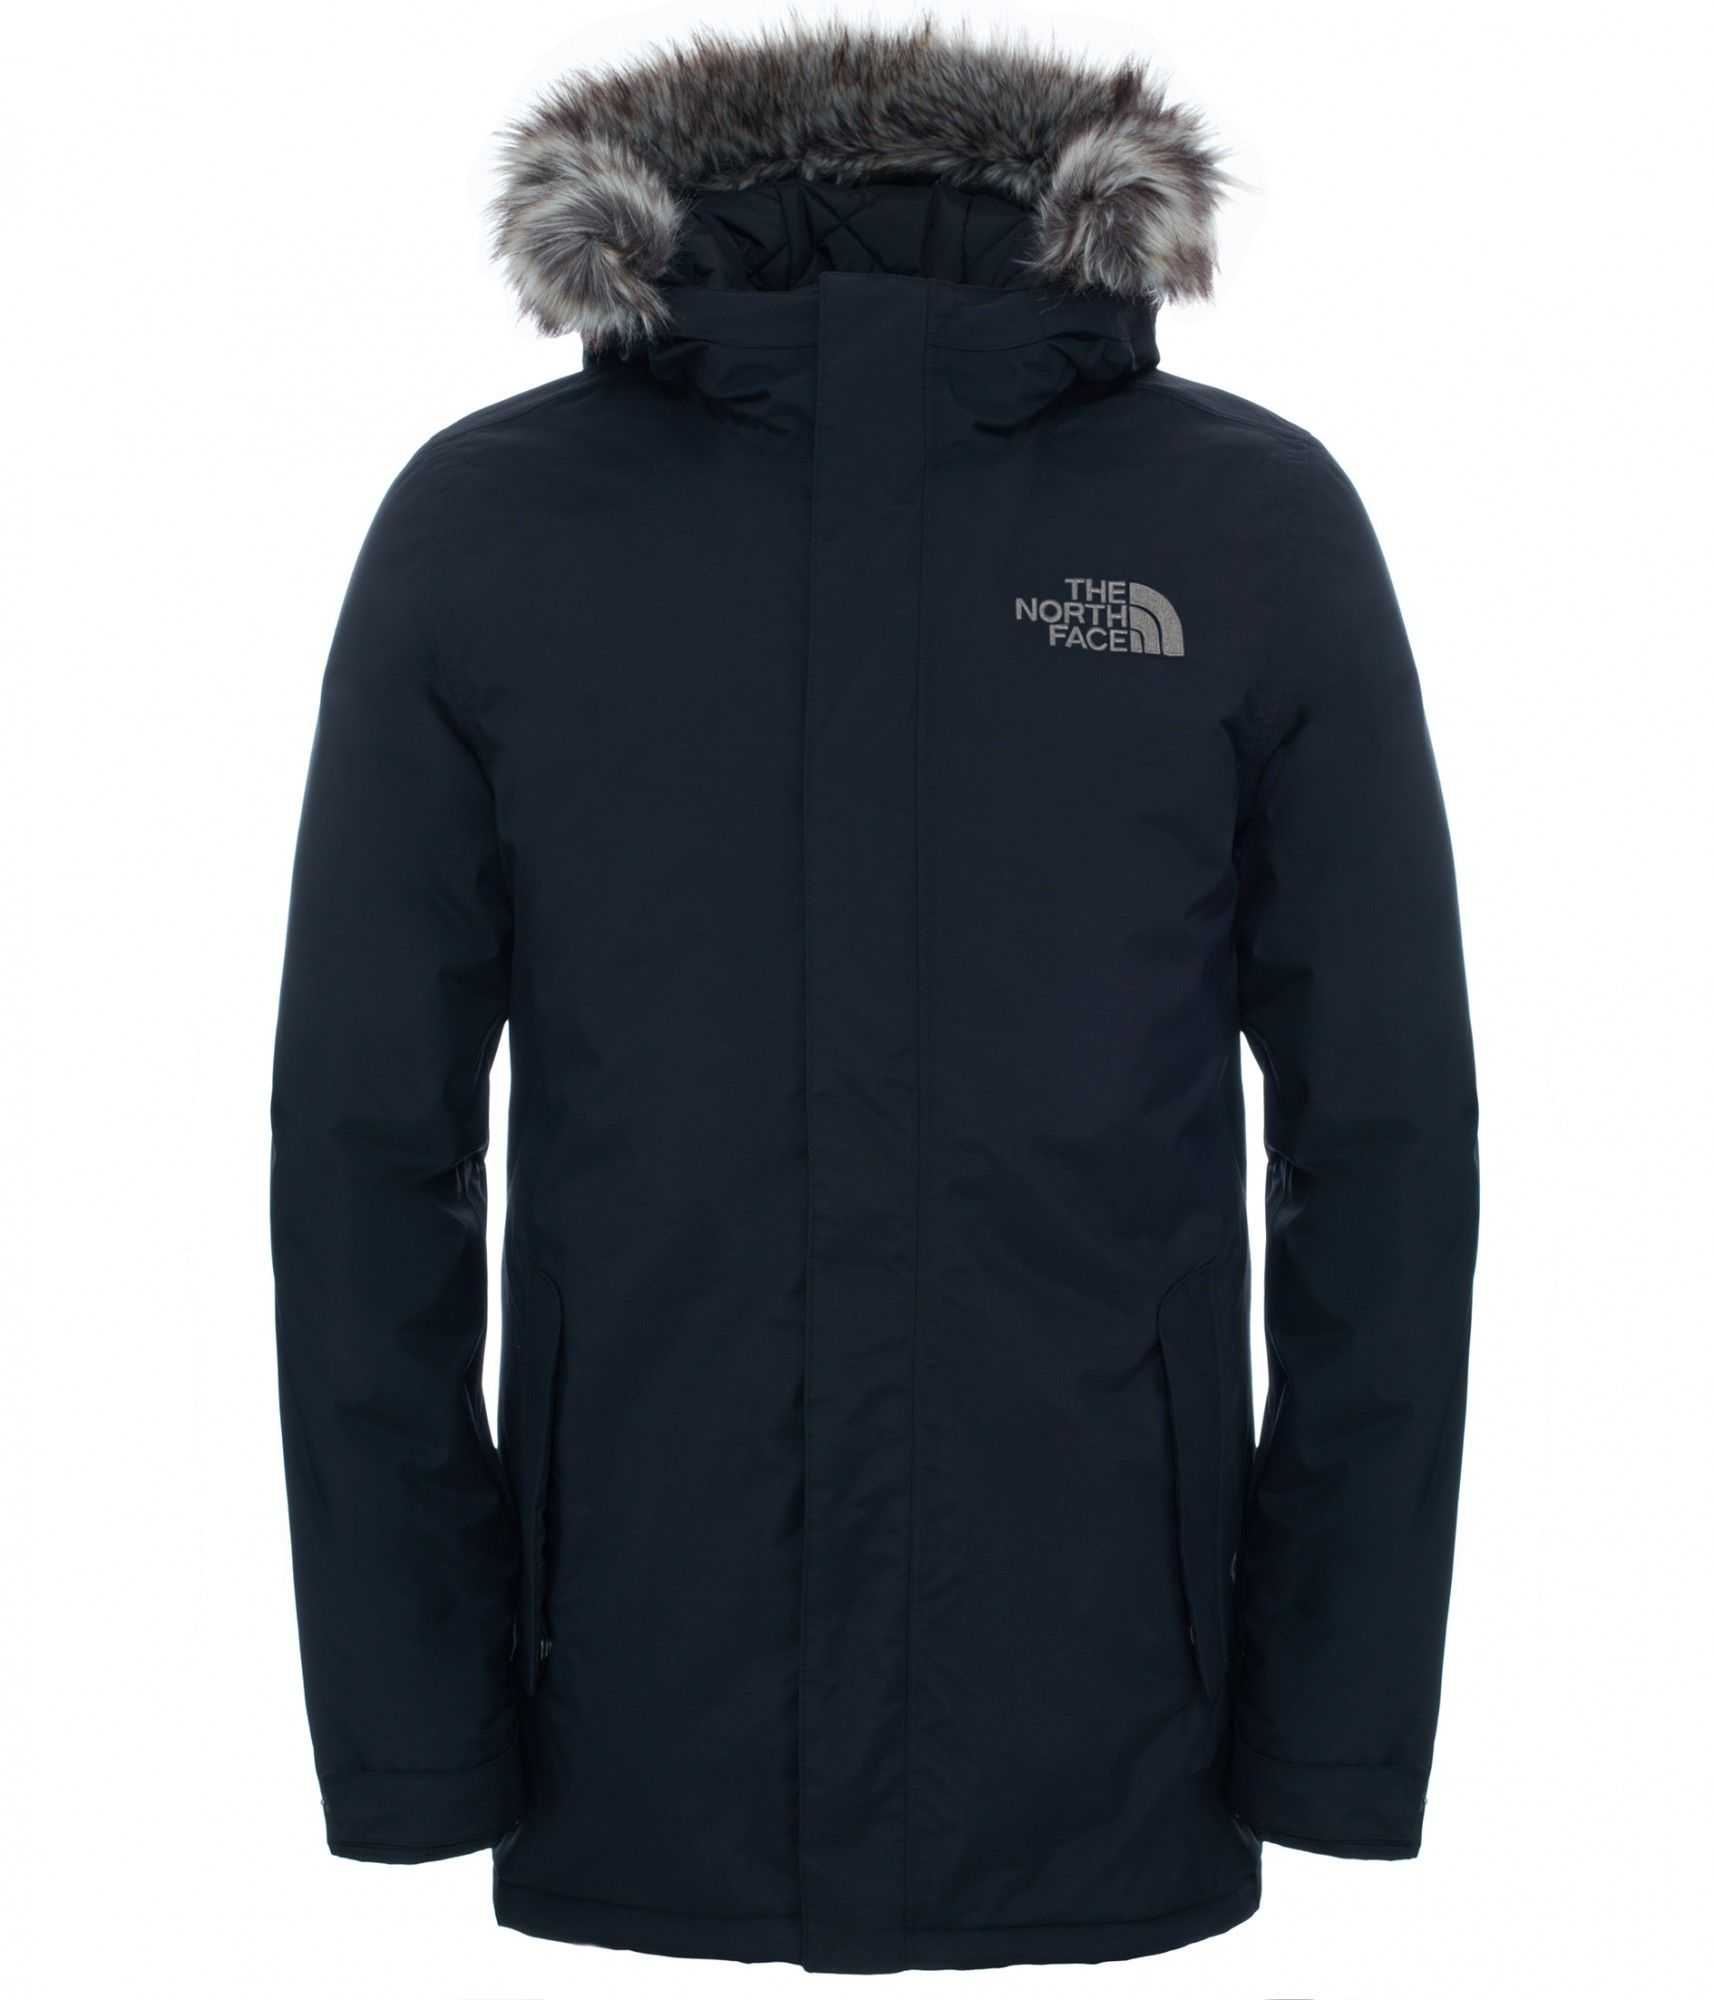 The North Face Zaneck Jacket Schwarz, Male Freizeitjacke, XL